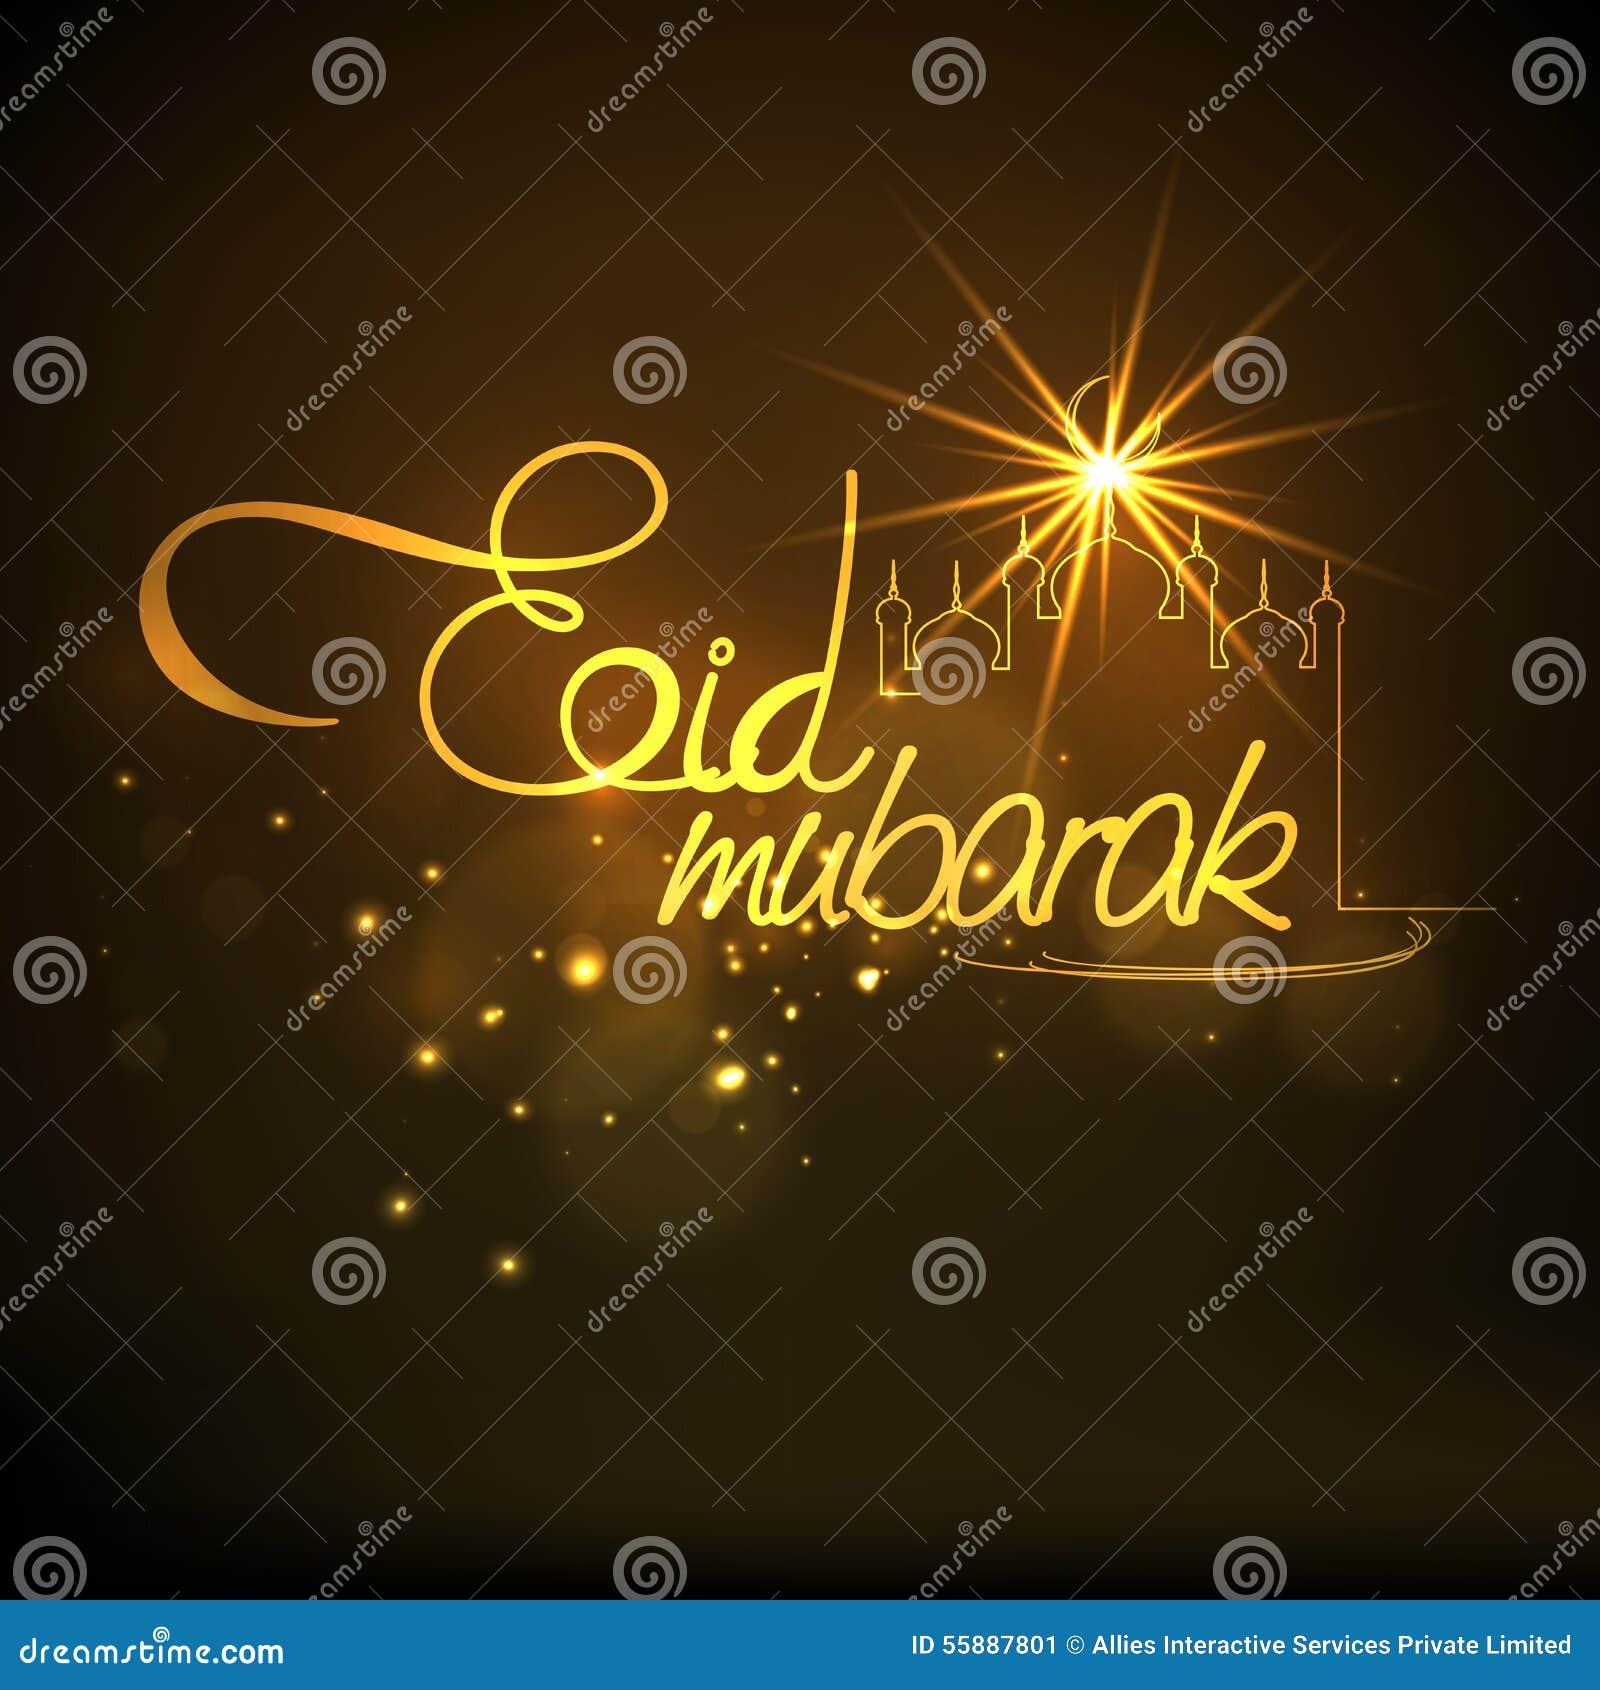 Elegant greeting card for eid mubarak celebration stock elegant greeting card for eid mubarak celebration m4hsunfo